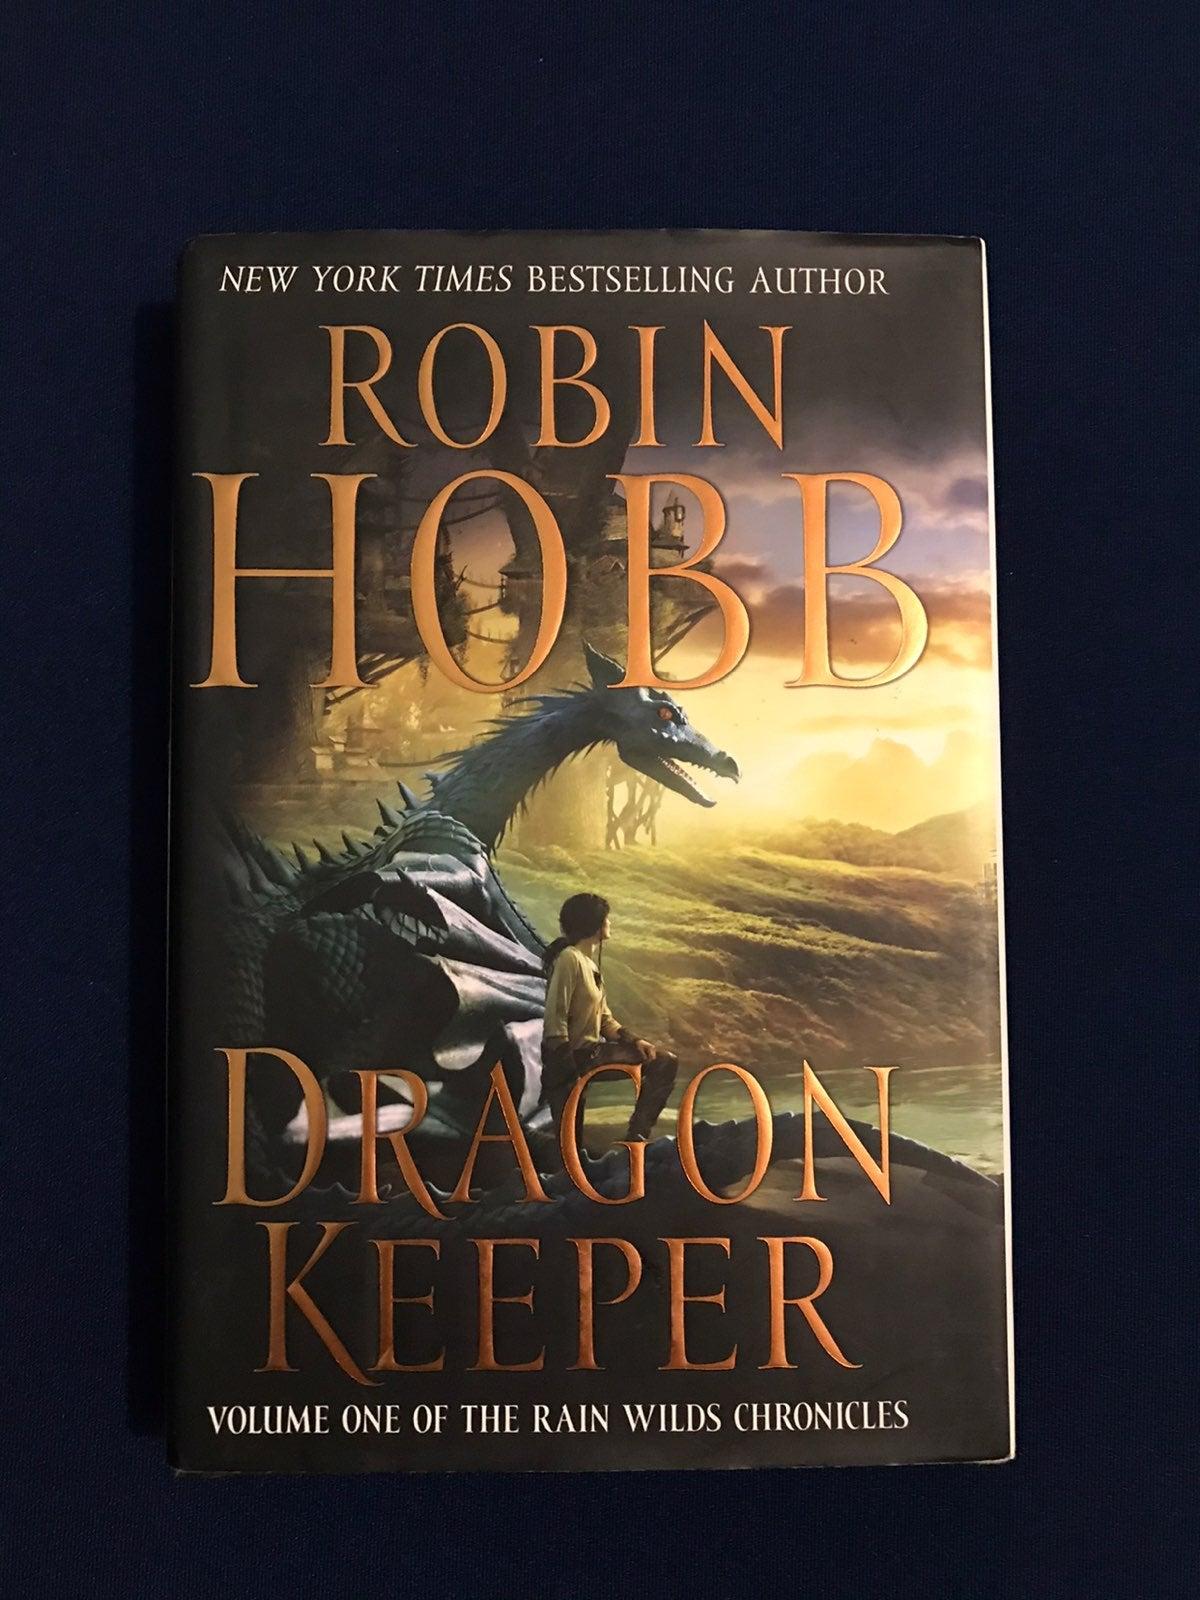 Dragon keeper book